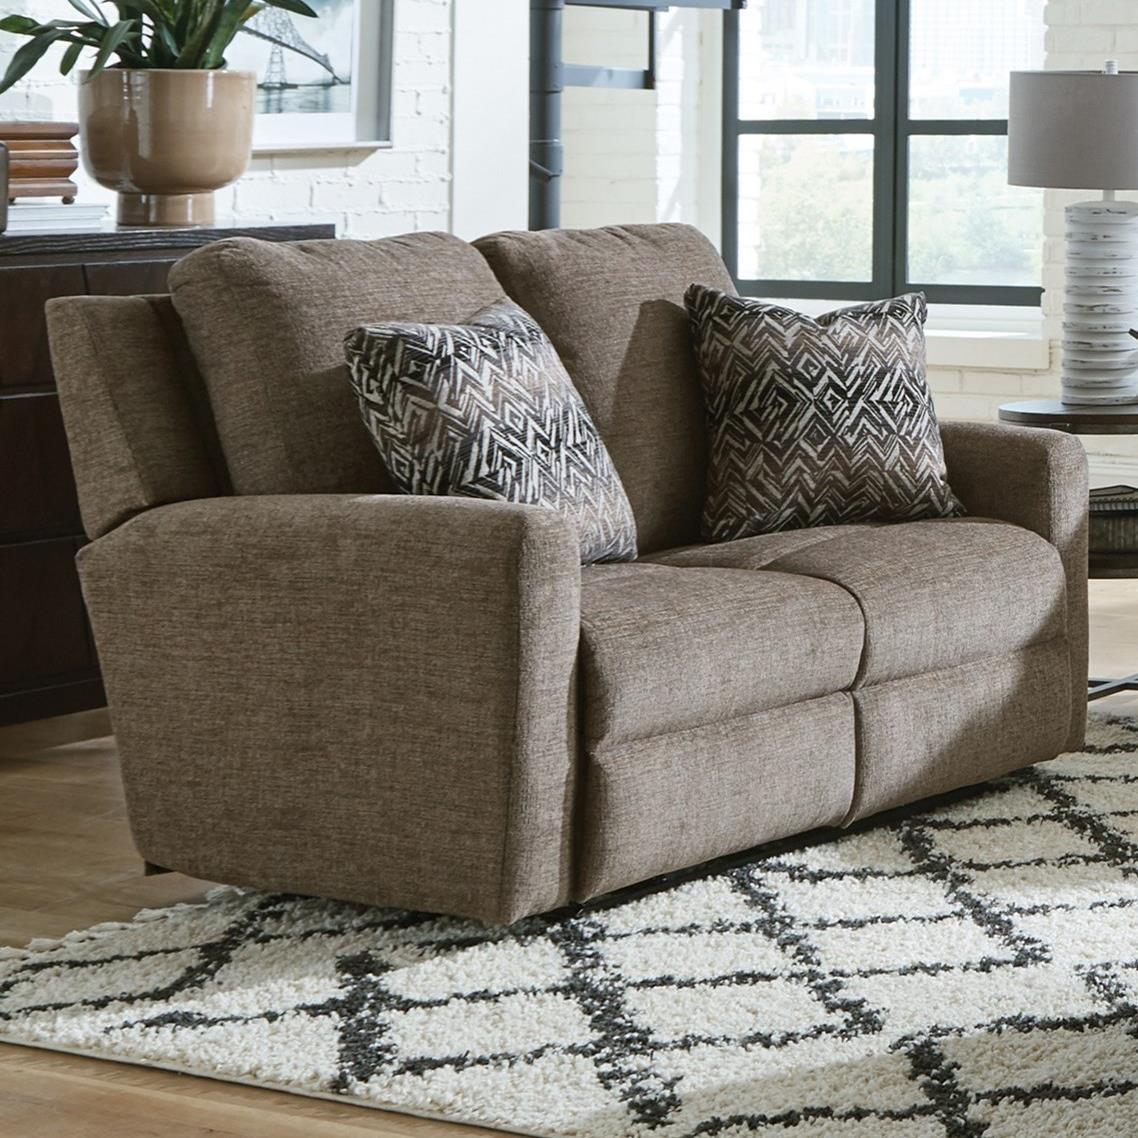 Calvin Reclining Loveseat by Catnapper at Standard Furniture